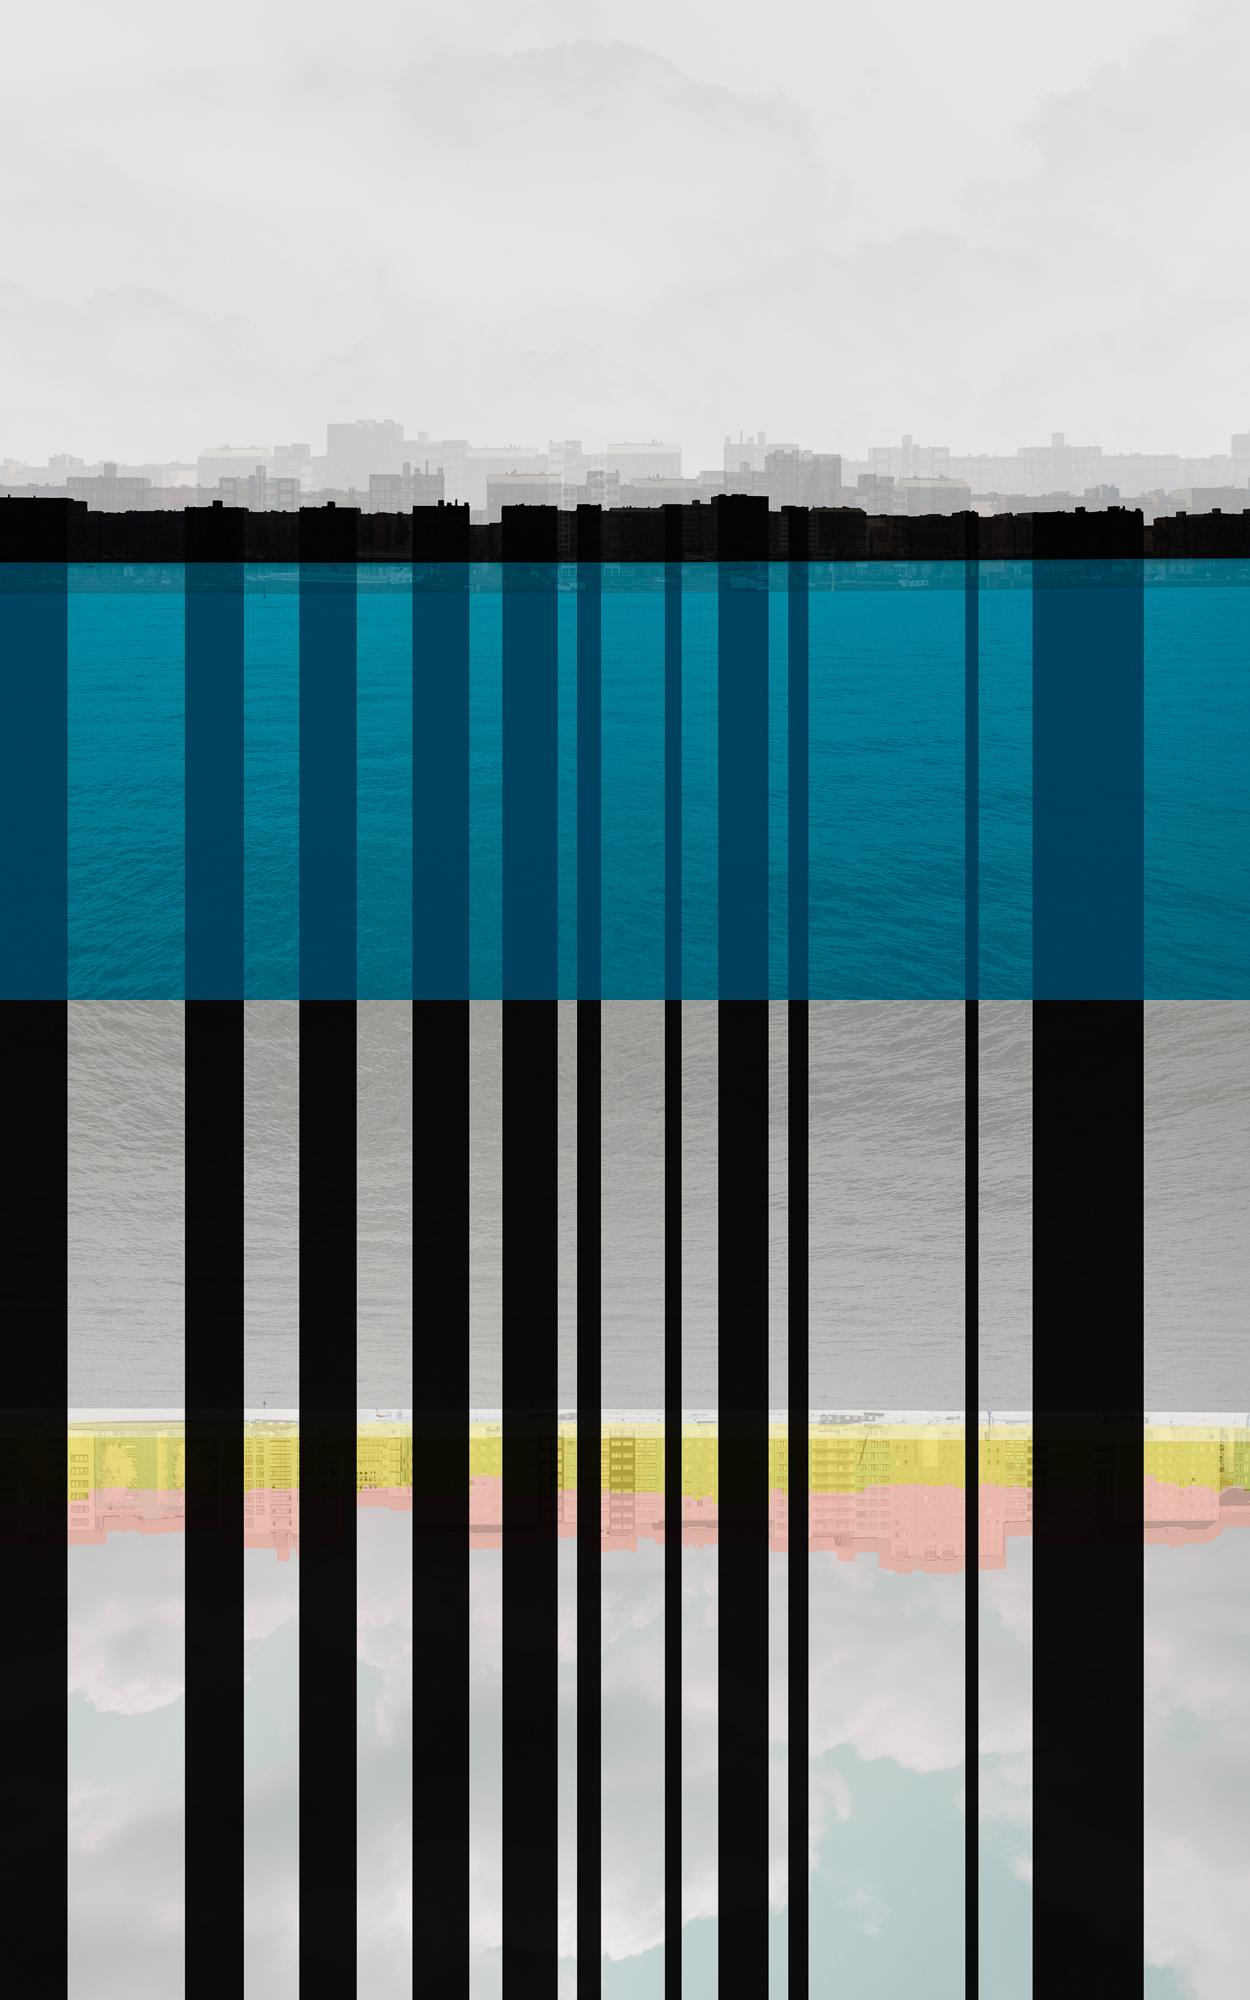 Jamie_Kripke_Down_the_Rhein_II-05.jpg